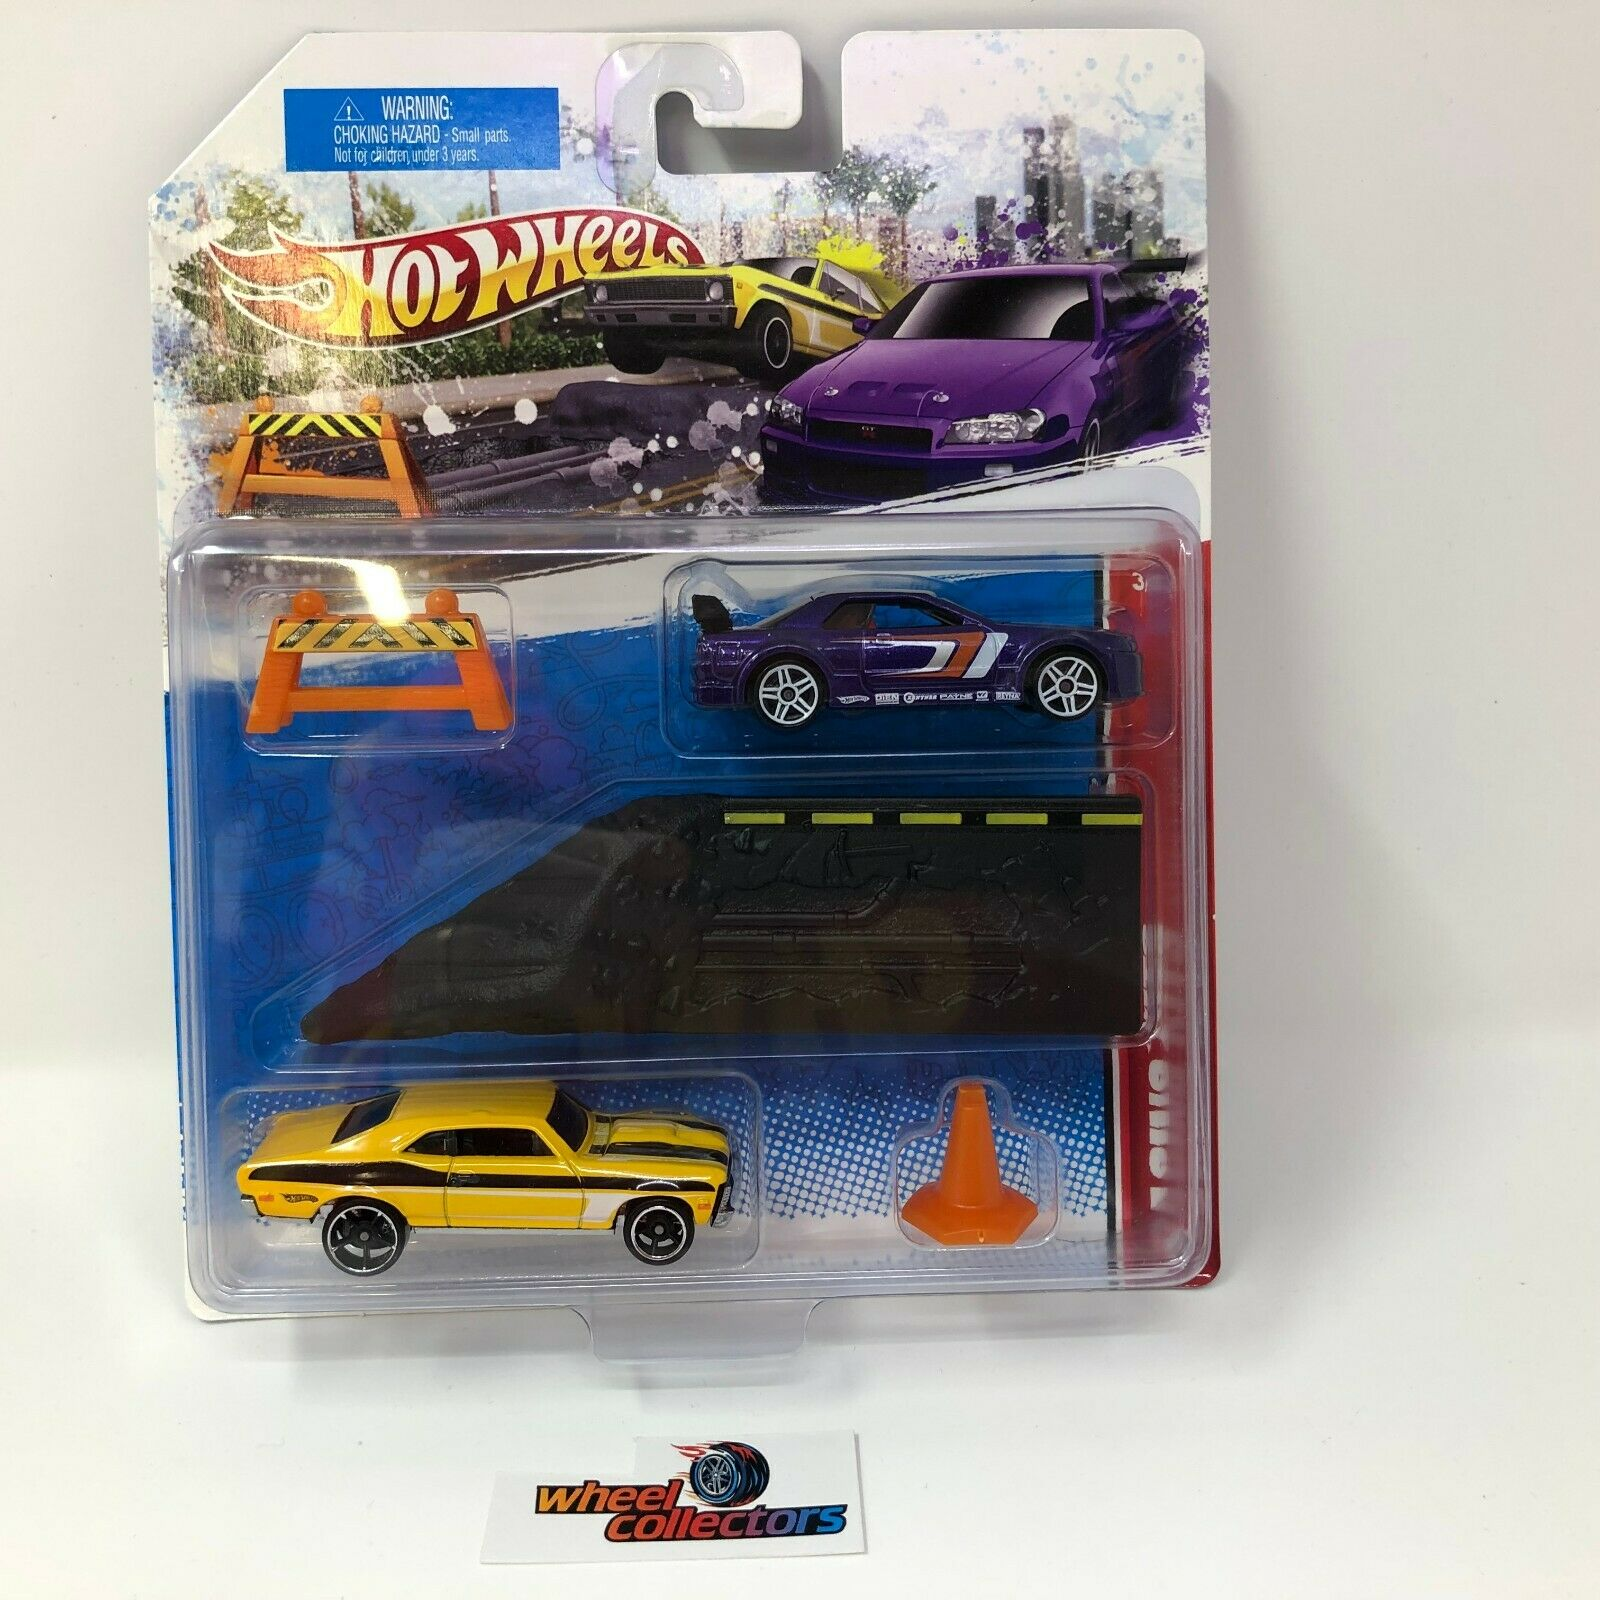 39 RACING KIT Nissan cieloline & Chevy Nova  caliente ruedaS  ZD8